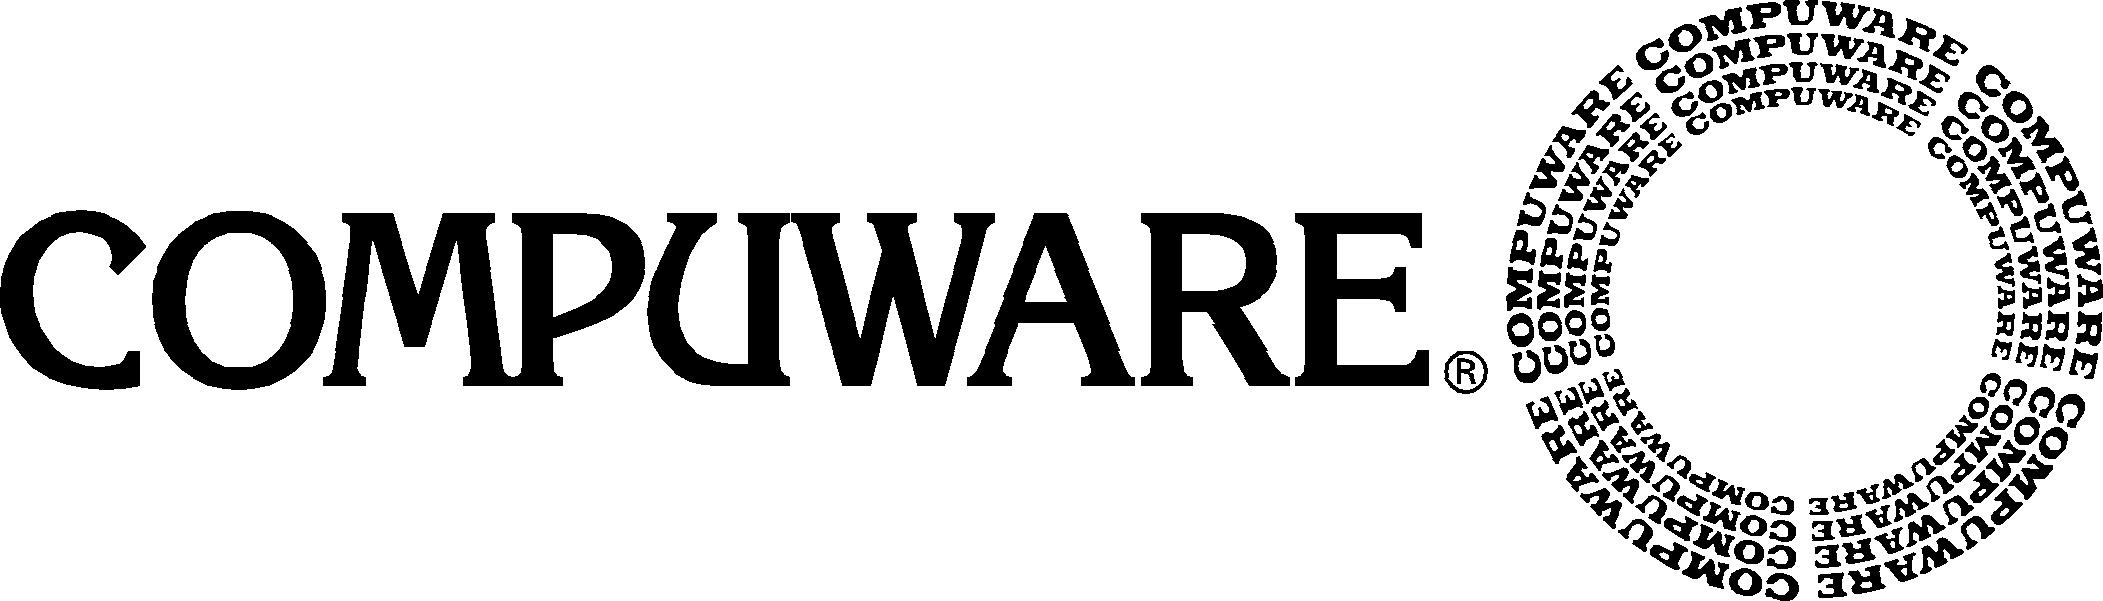 Compuware.JPG